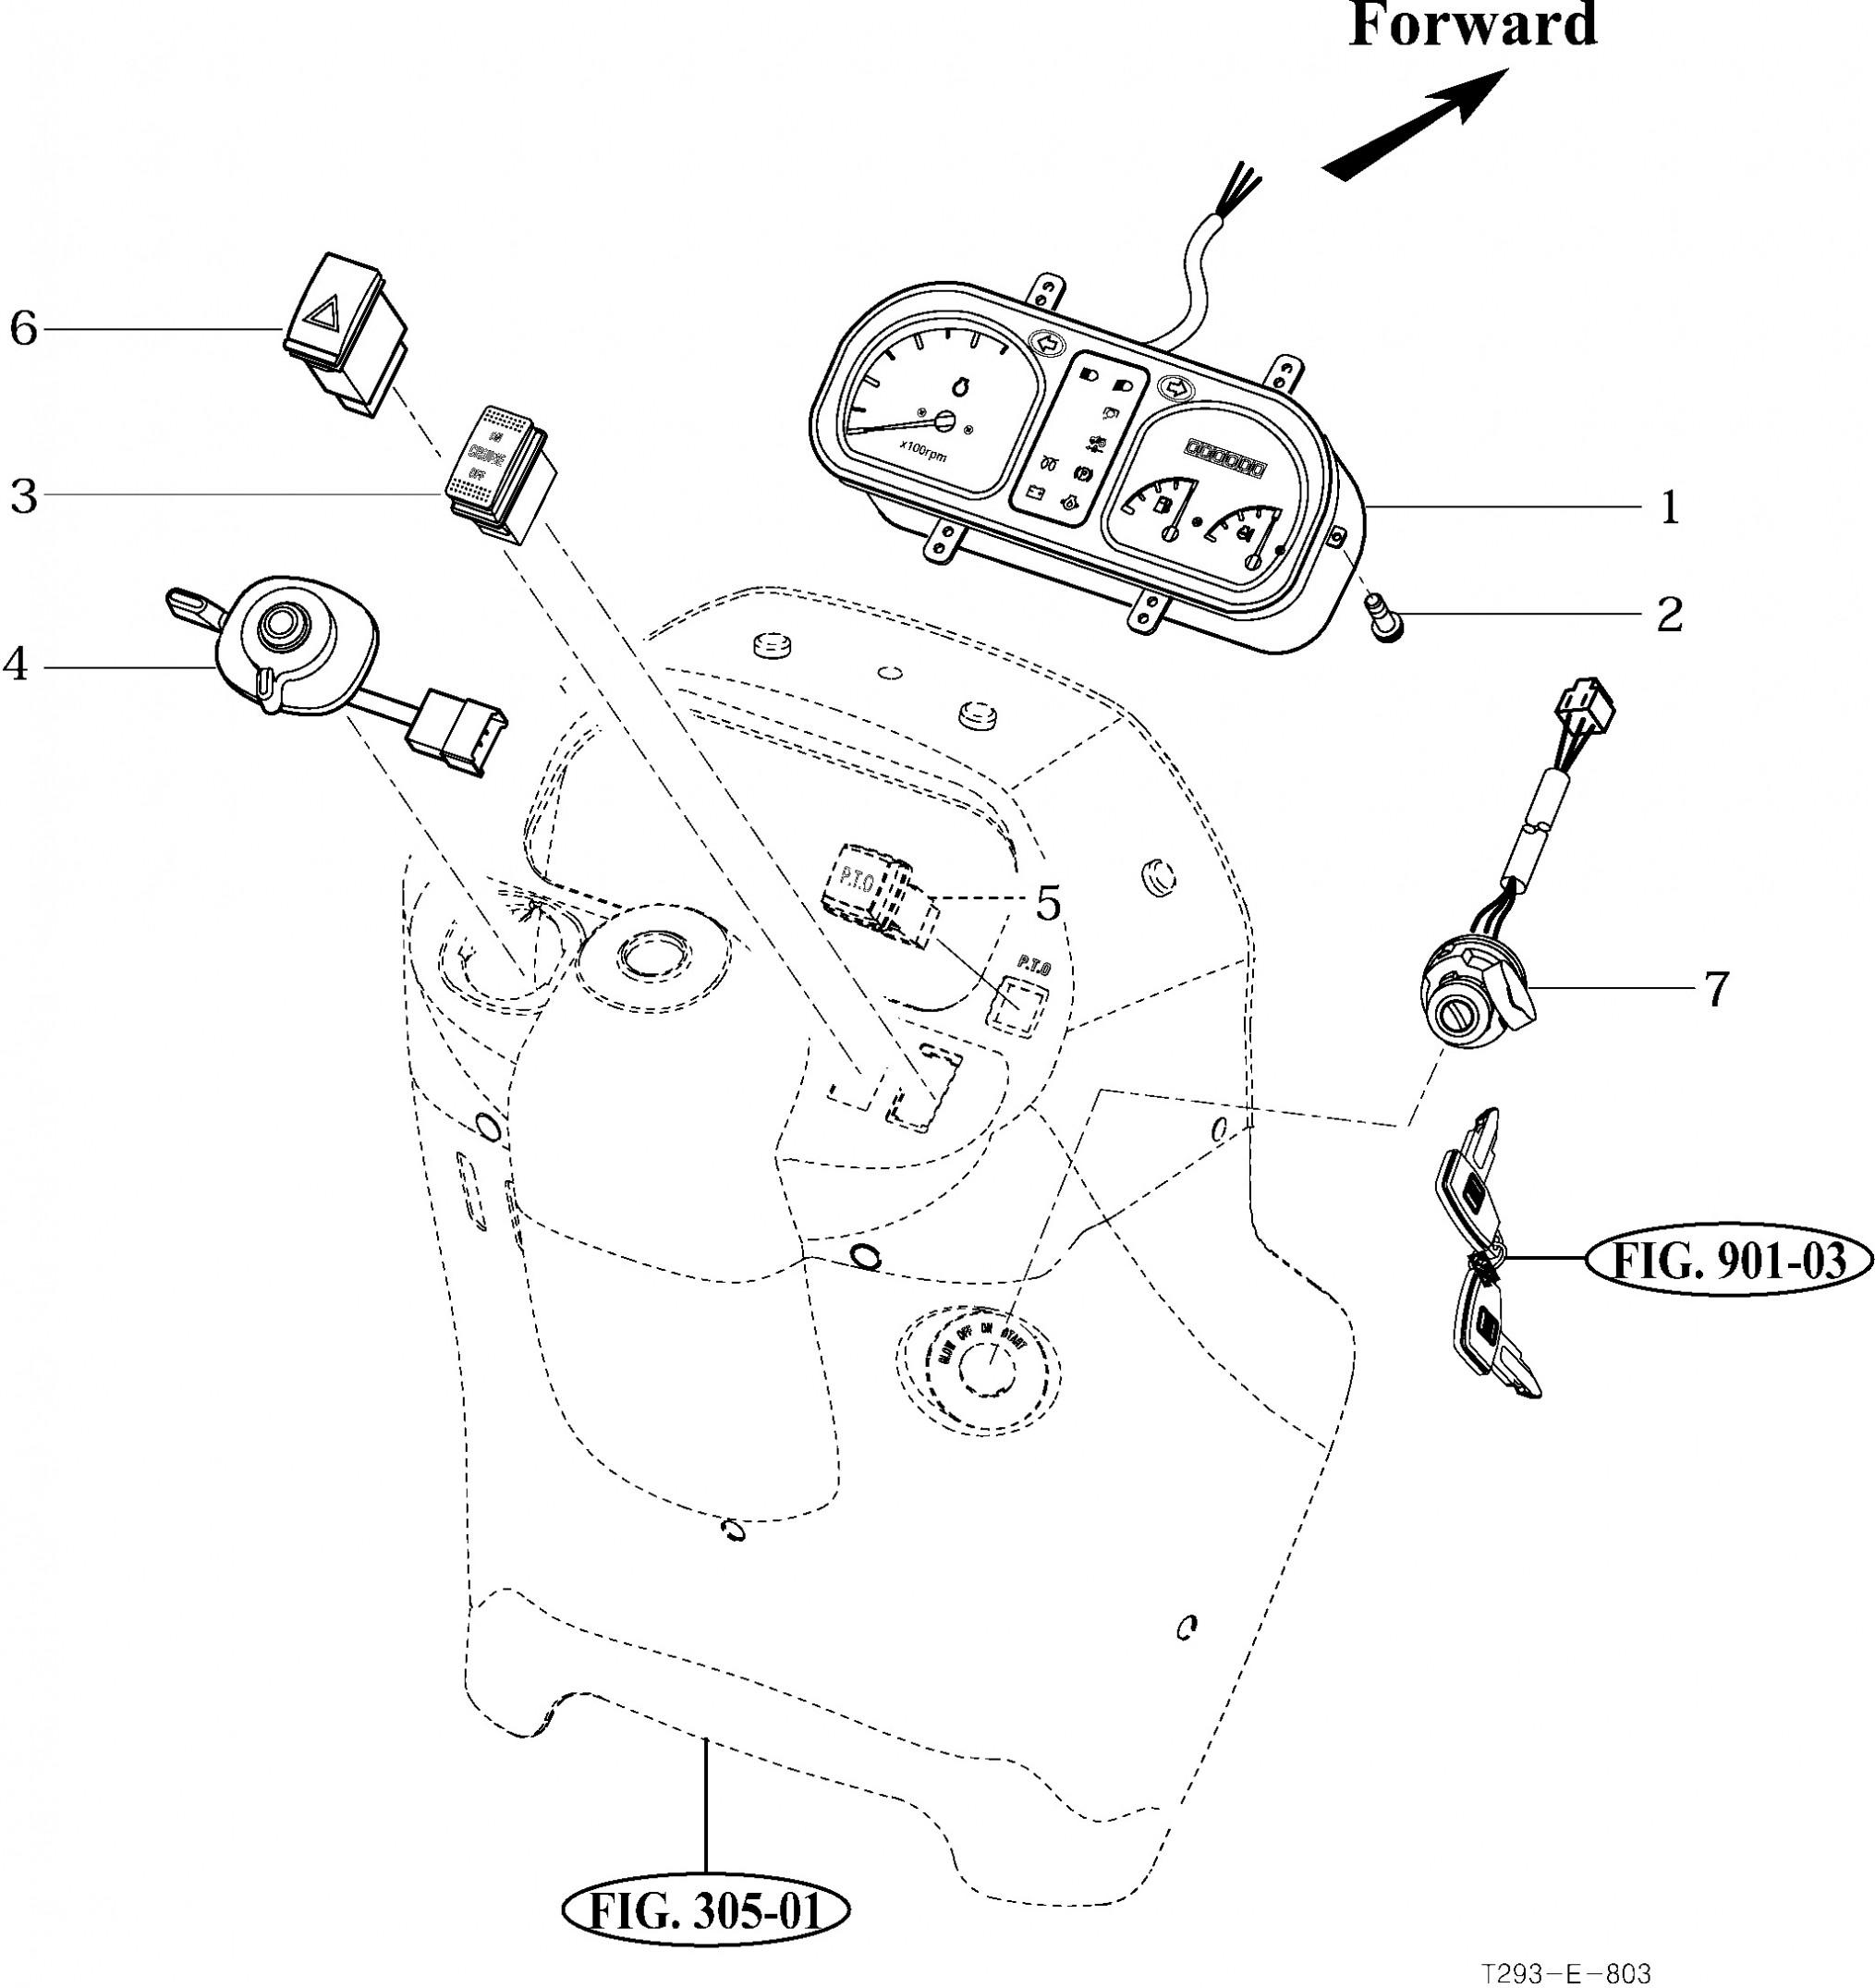 2002 Subaru Wrx Engine Diagram Cool Review About 2002 Wrx Engine with Breathtaking Of 2002 Subaru Wrx Engine Diagram